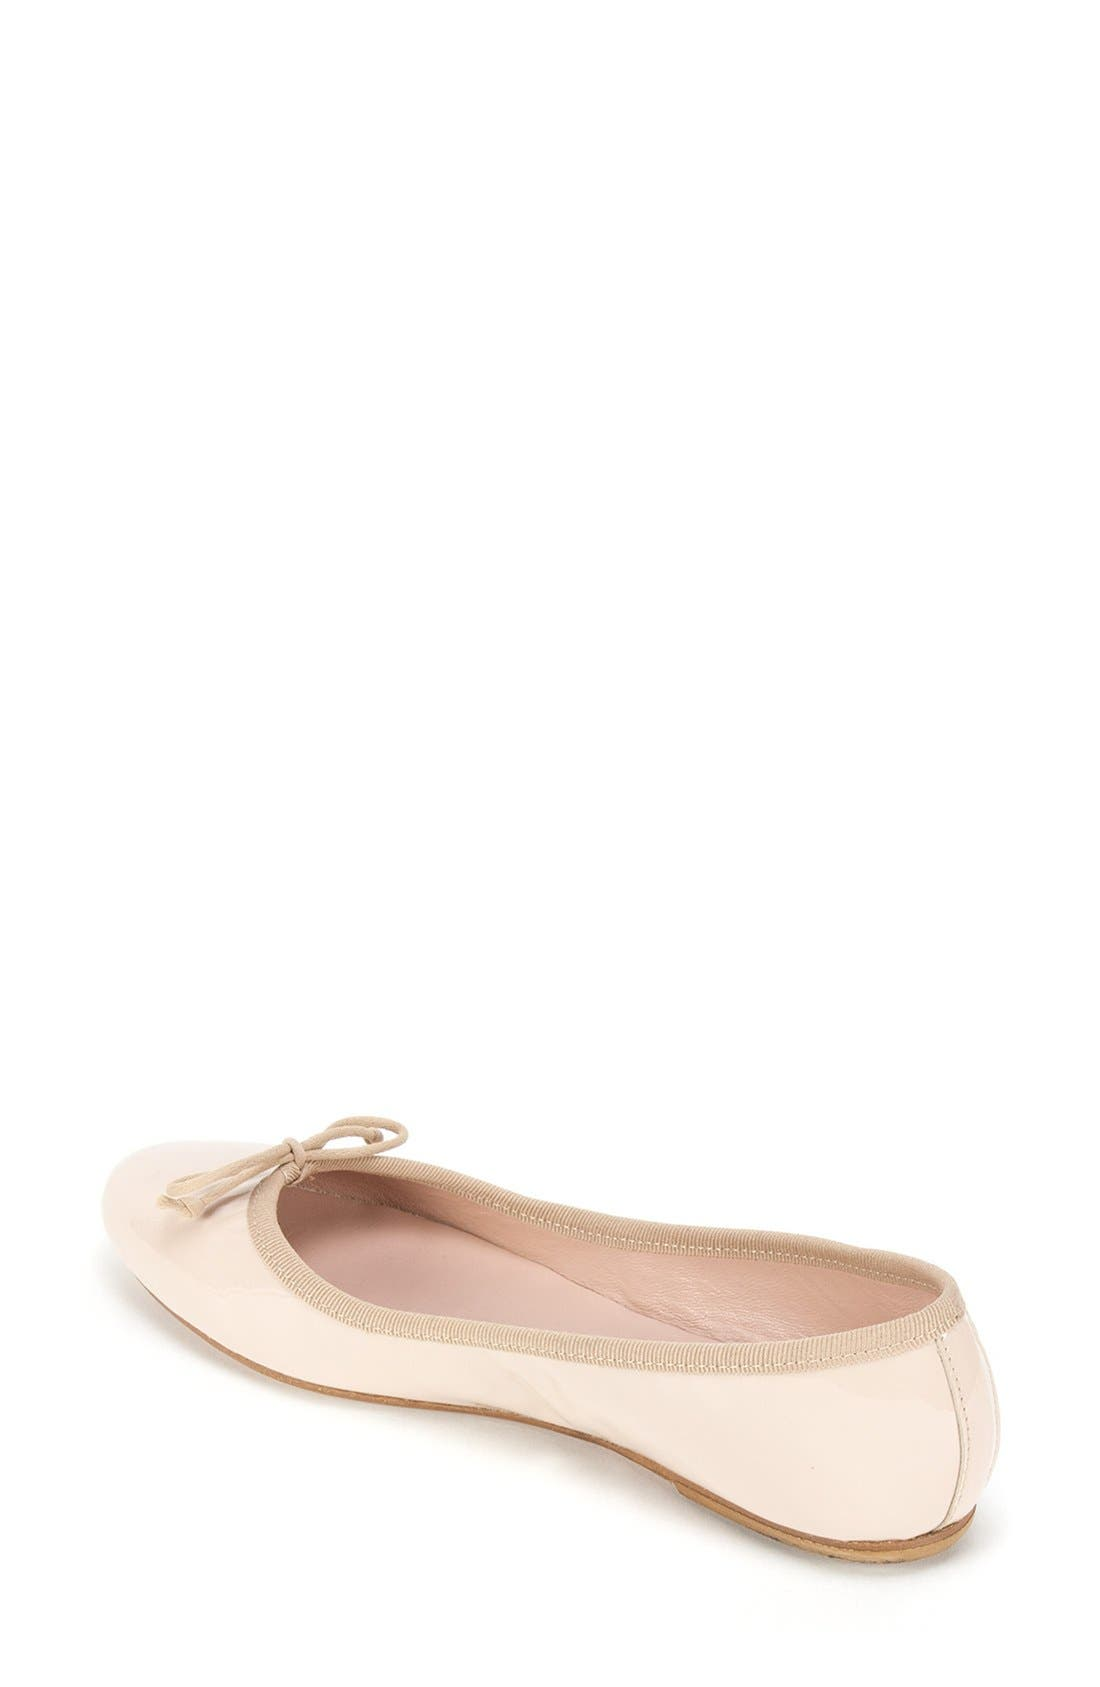 'Kendall' Ballet Flat,                             Alternate thumbnail 2, color,                             251